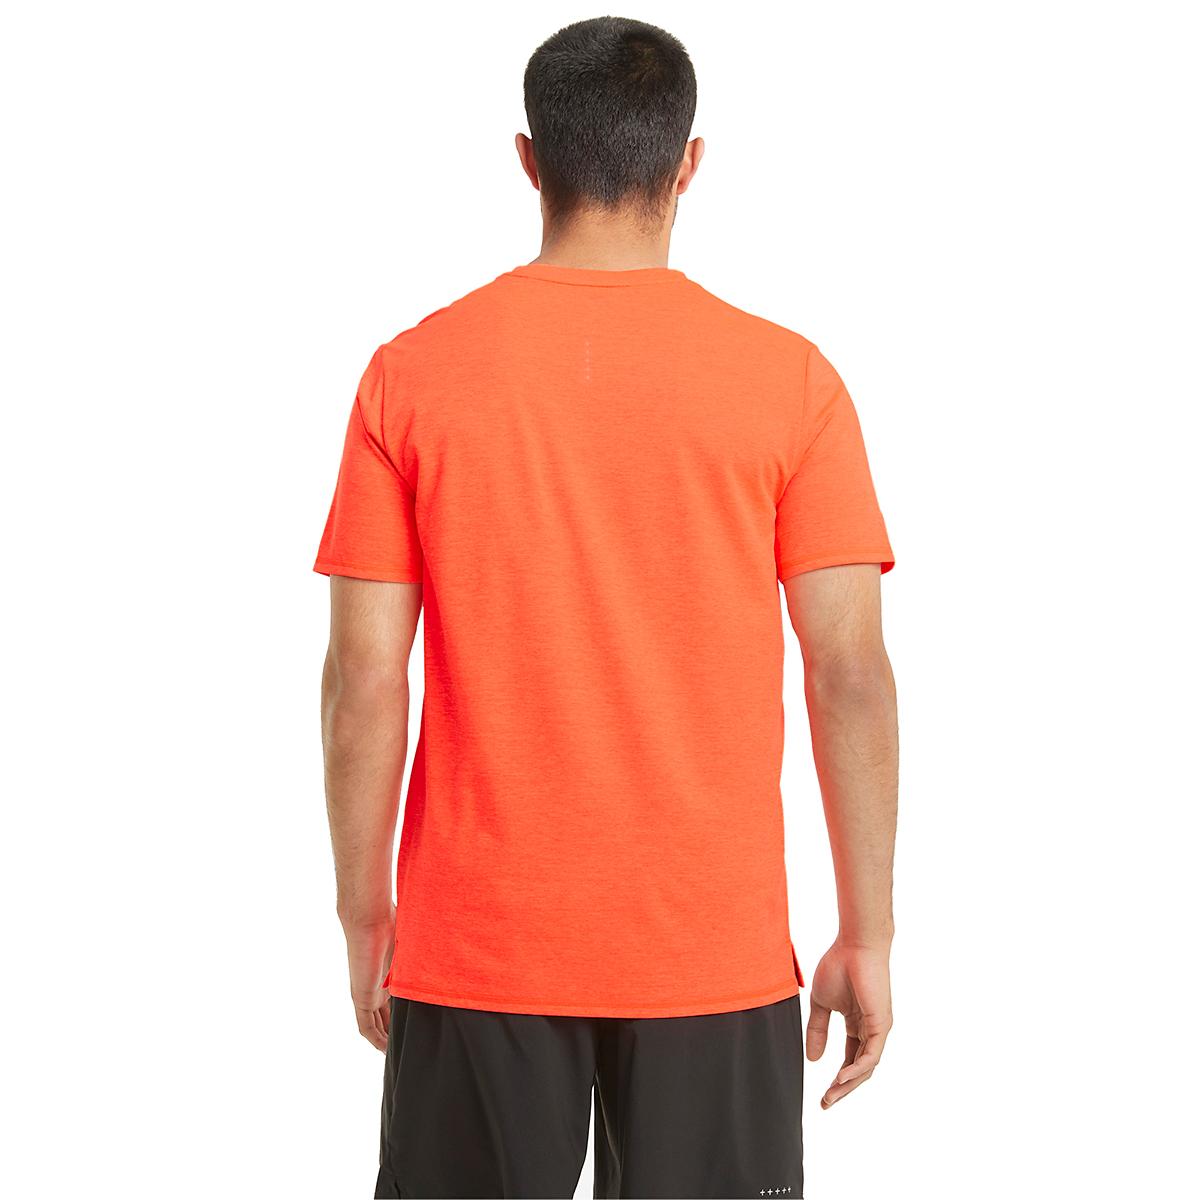 Men's Puma Favorite Heather Short Sleeve Running Tee - Color: Lava Blast - Size: S, Lava Blast, large, image 2